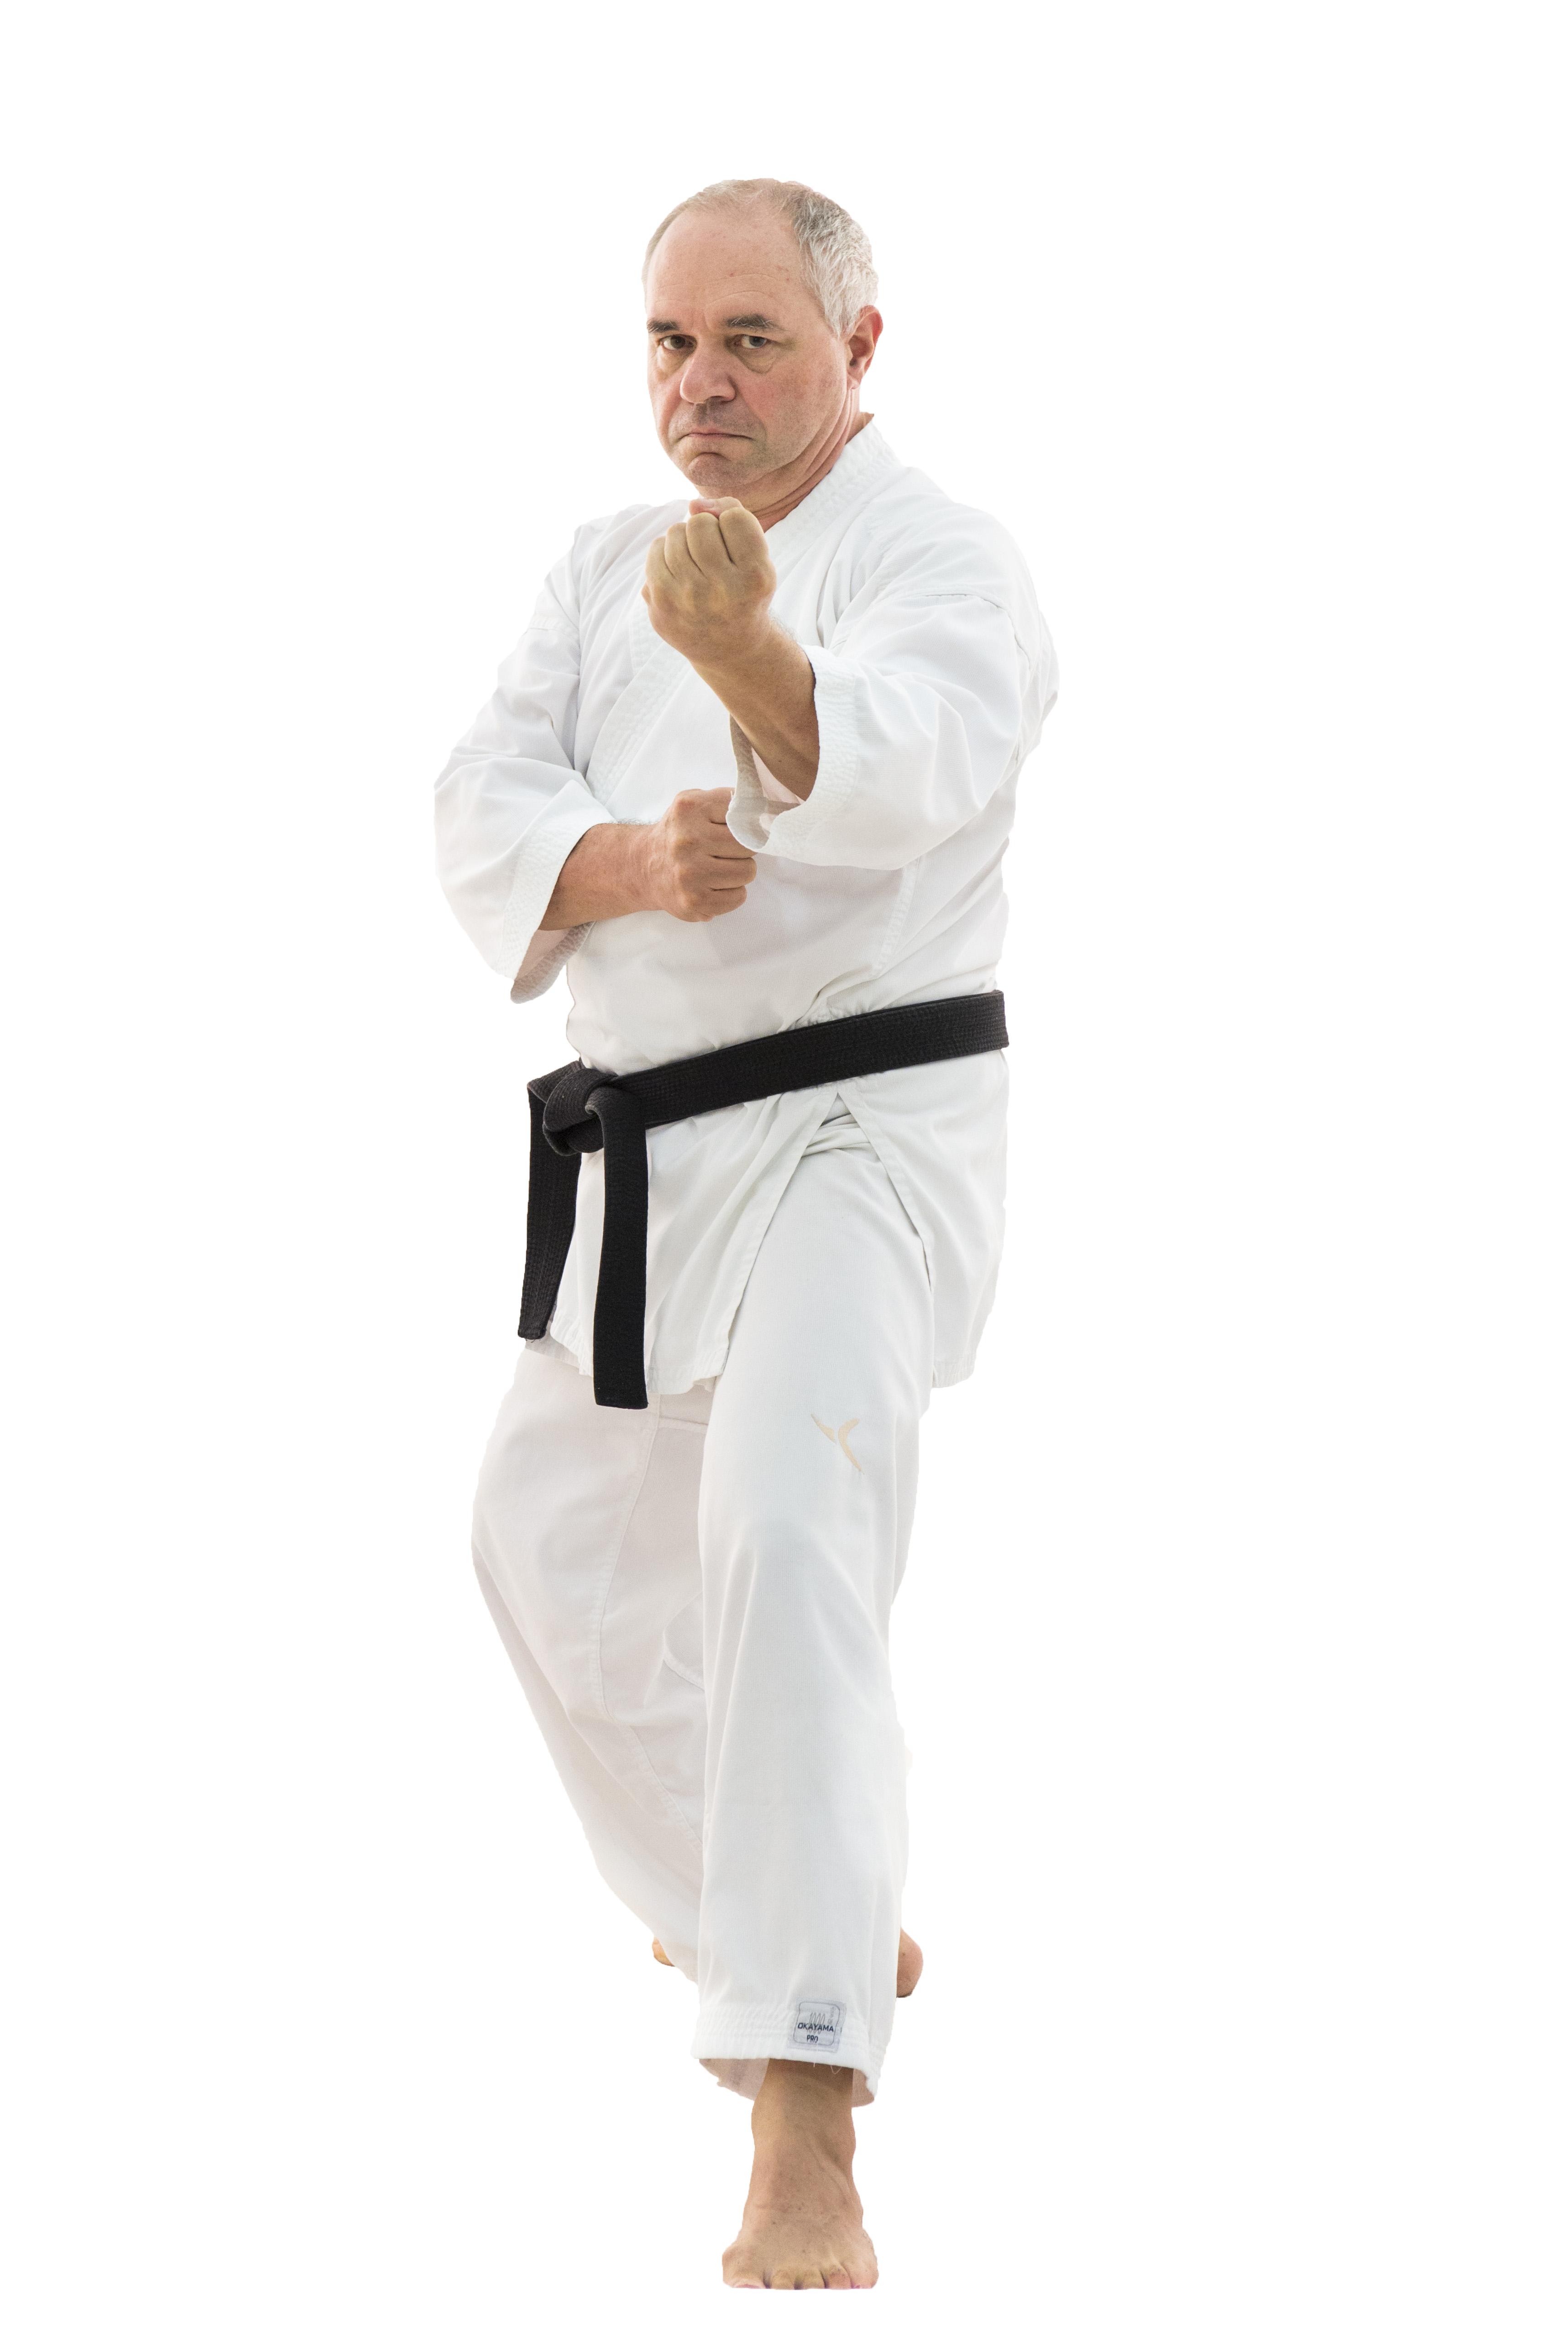 marco marzaloni sfondo bianco